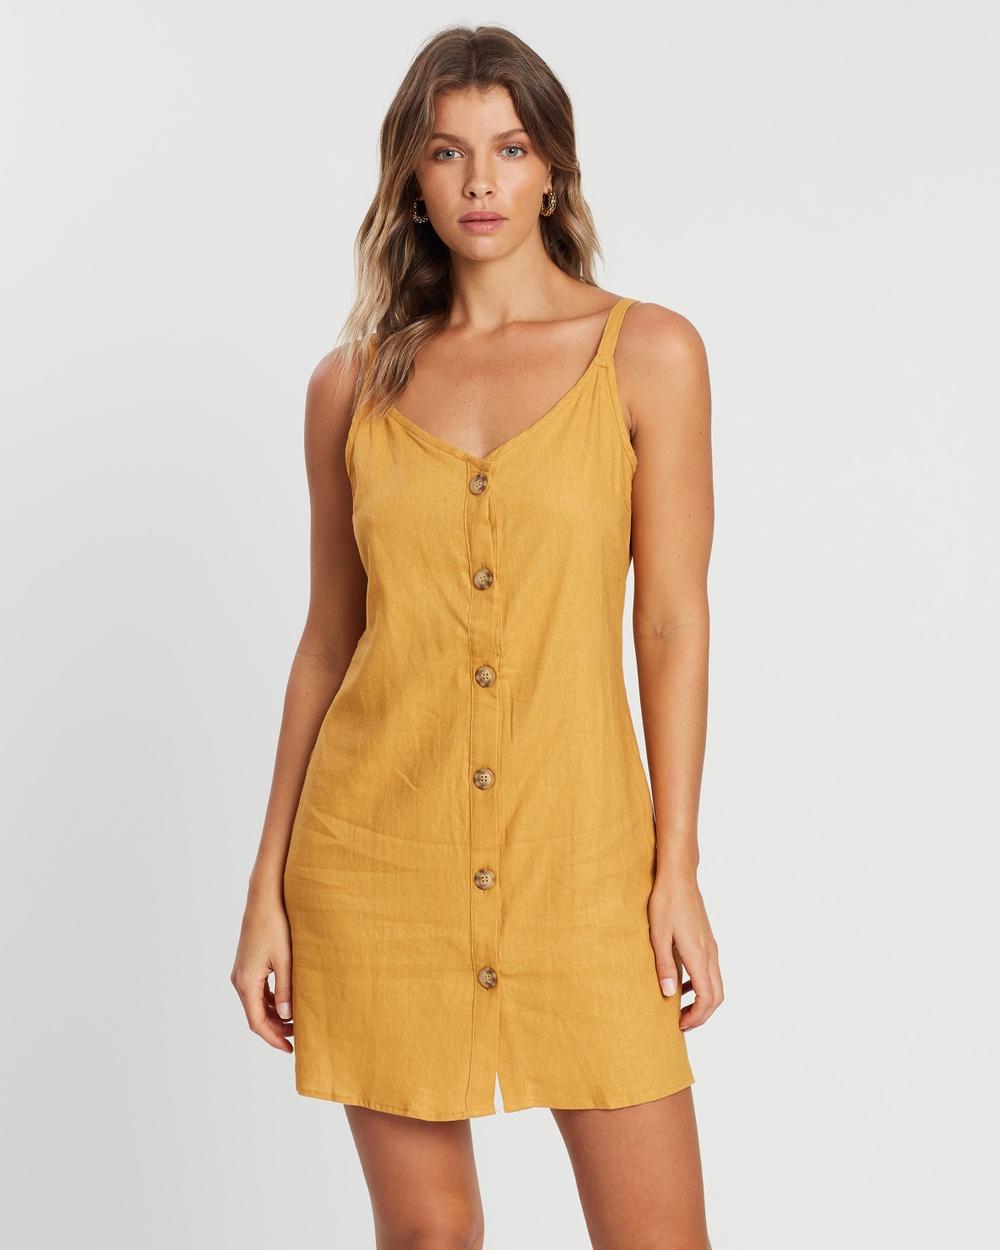 Cotton On Spruce Yellow Woven Margot Slip Dress